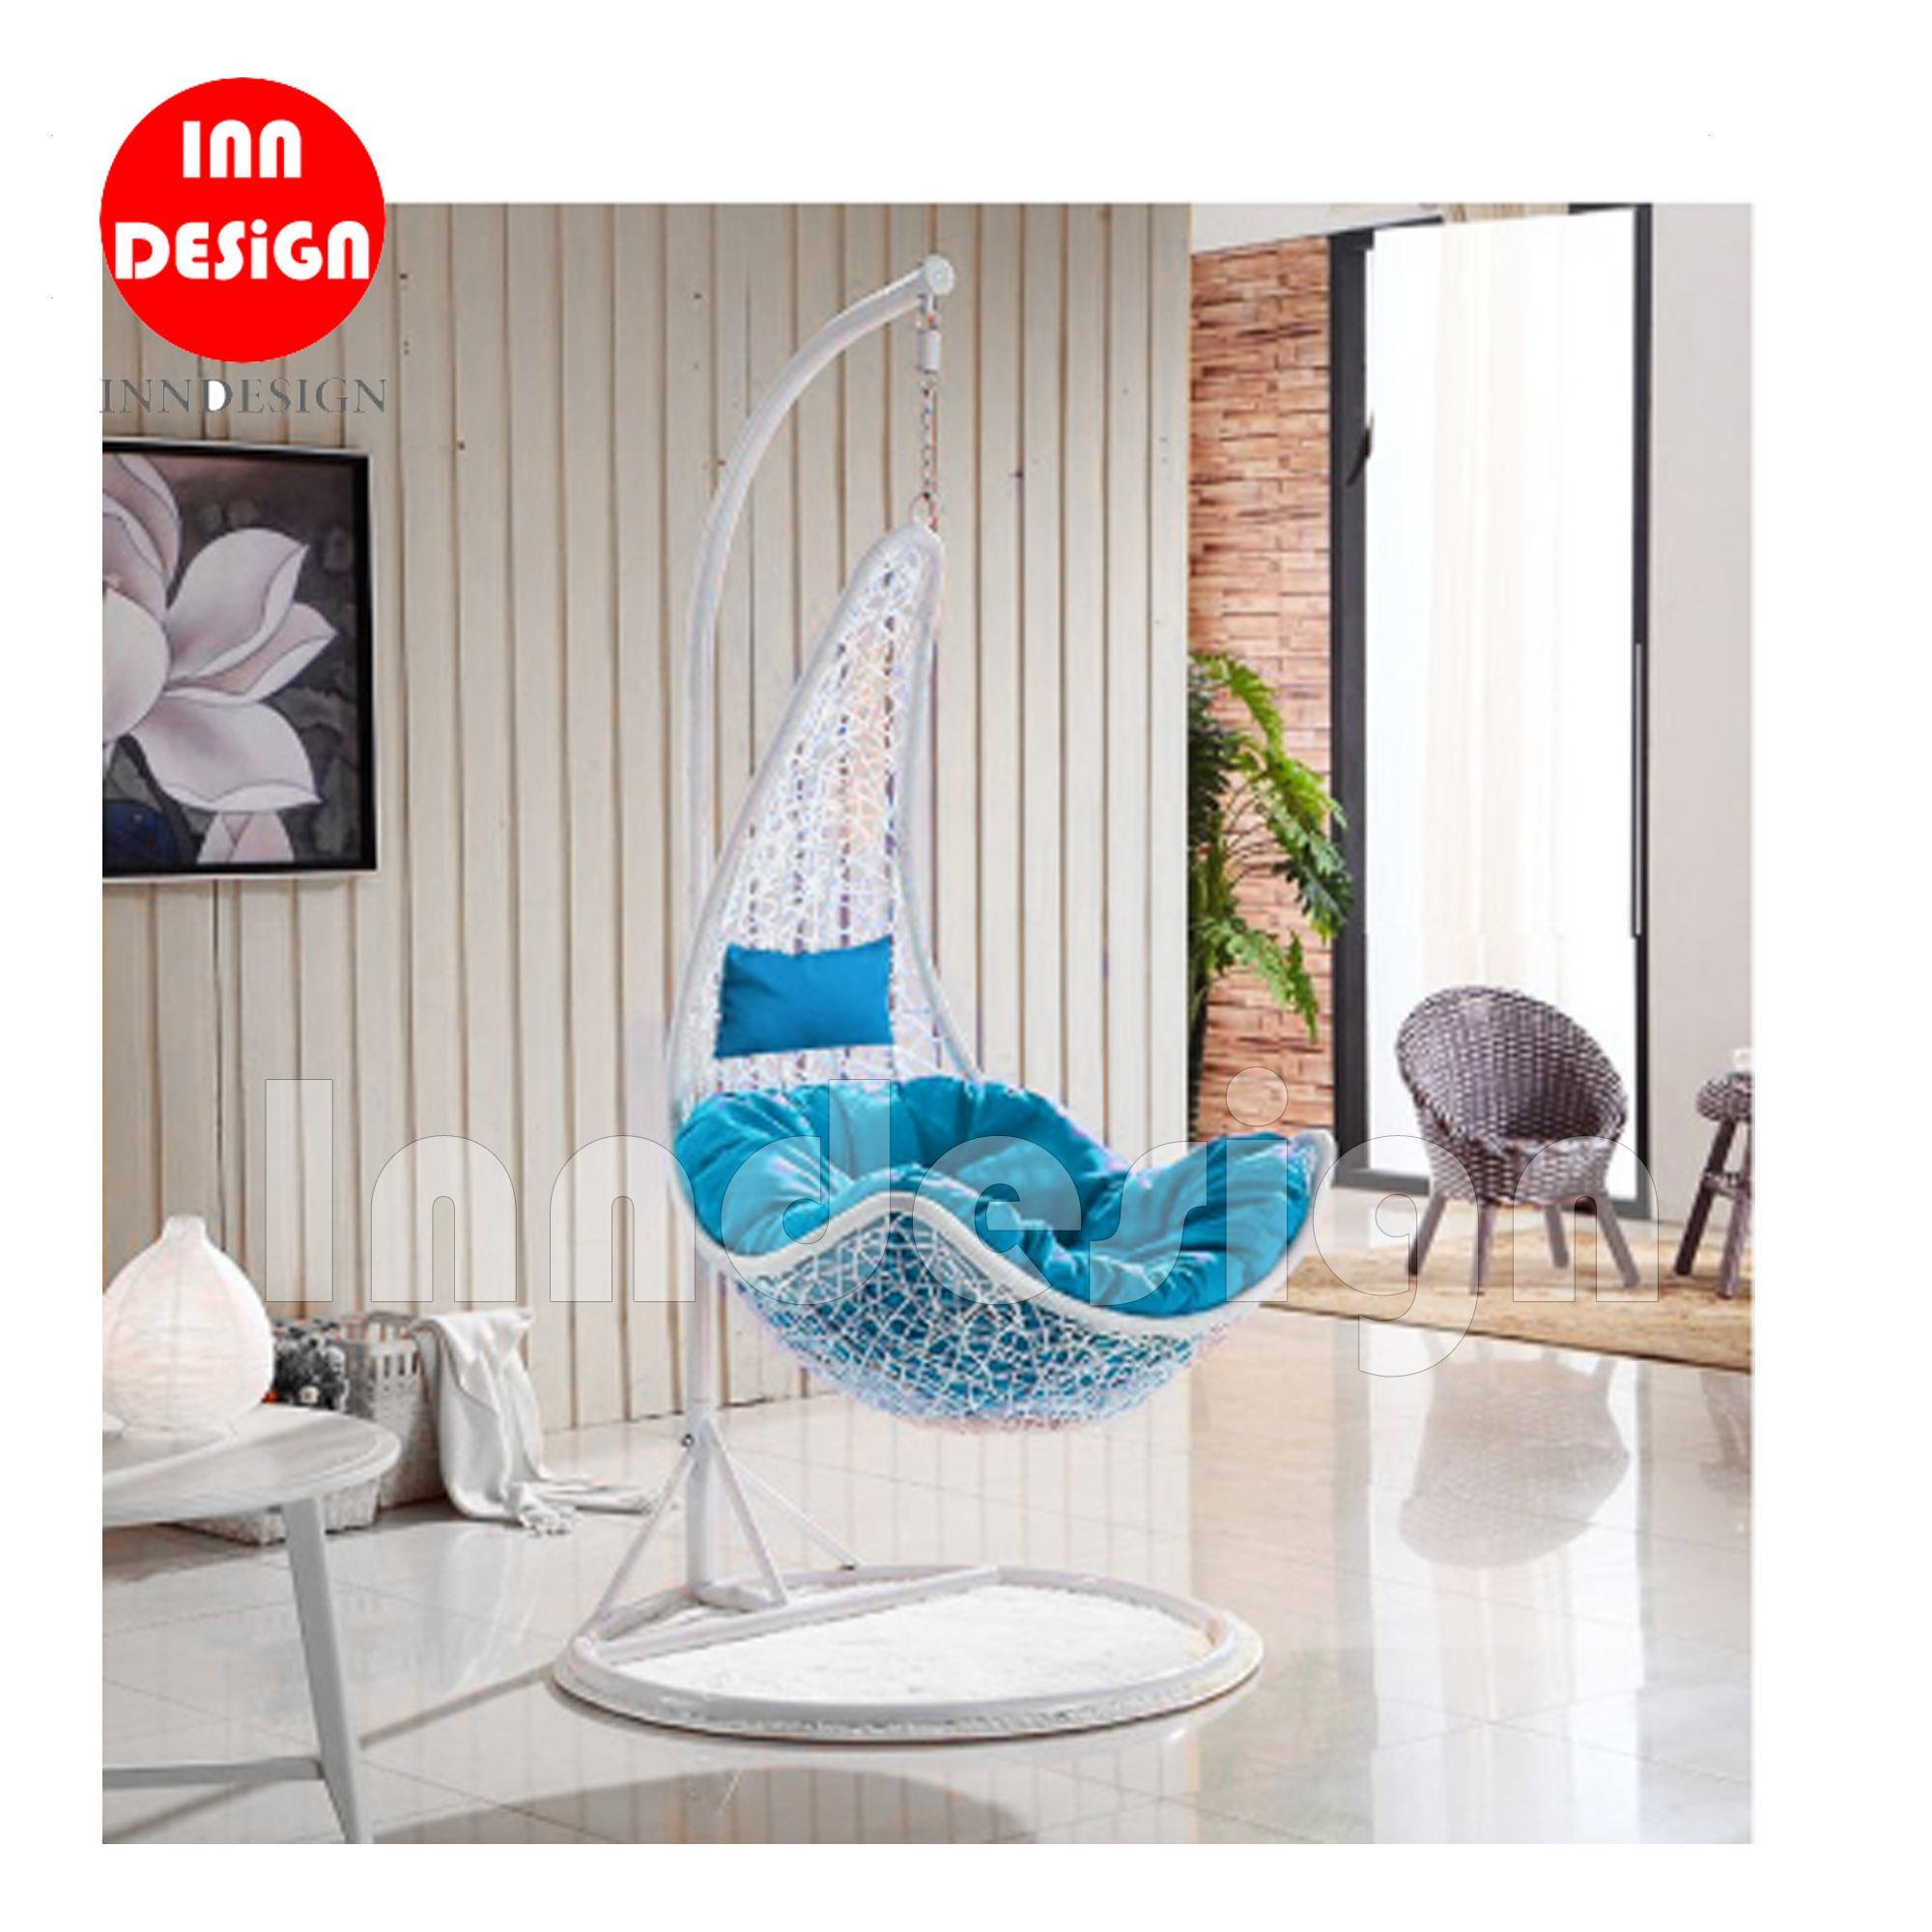 Miki Swing Chair / Lounge Chair / Relax Chair (White + Blue)